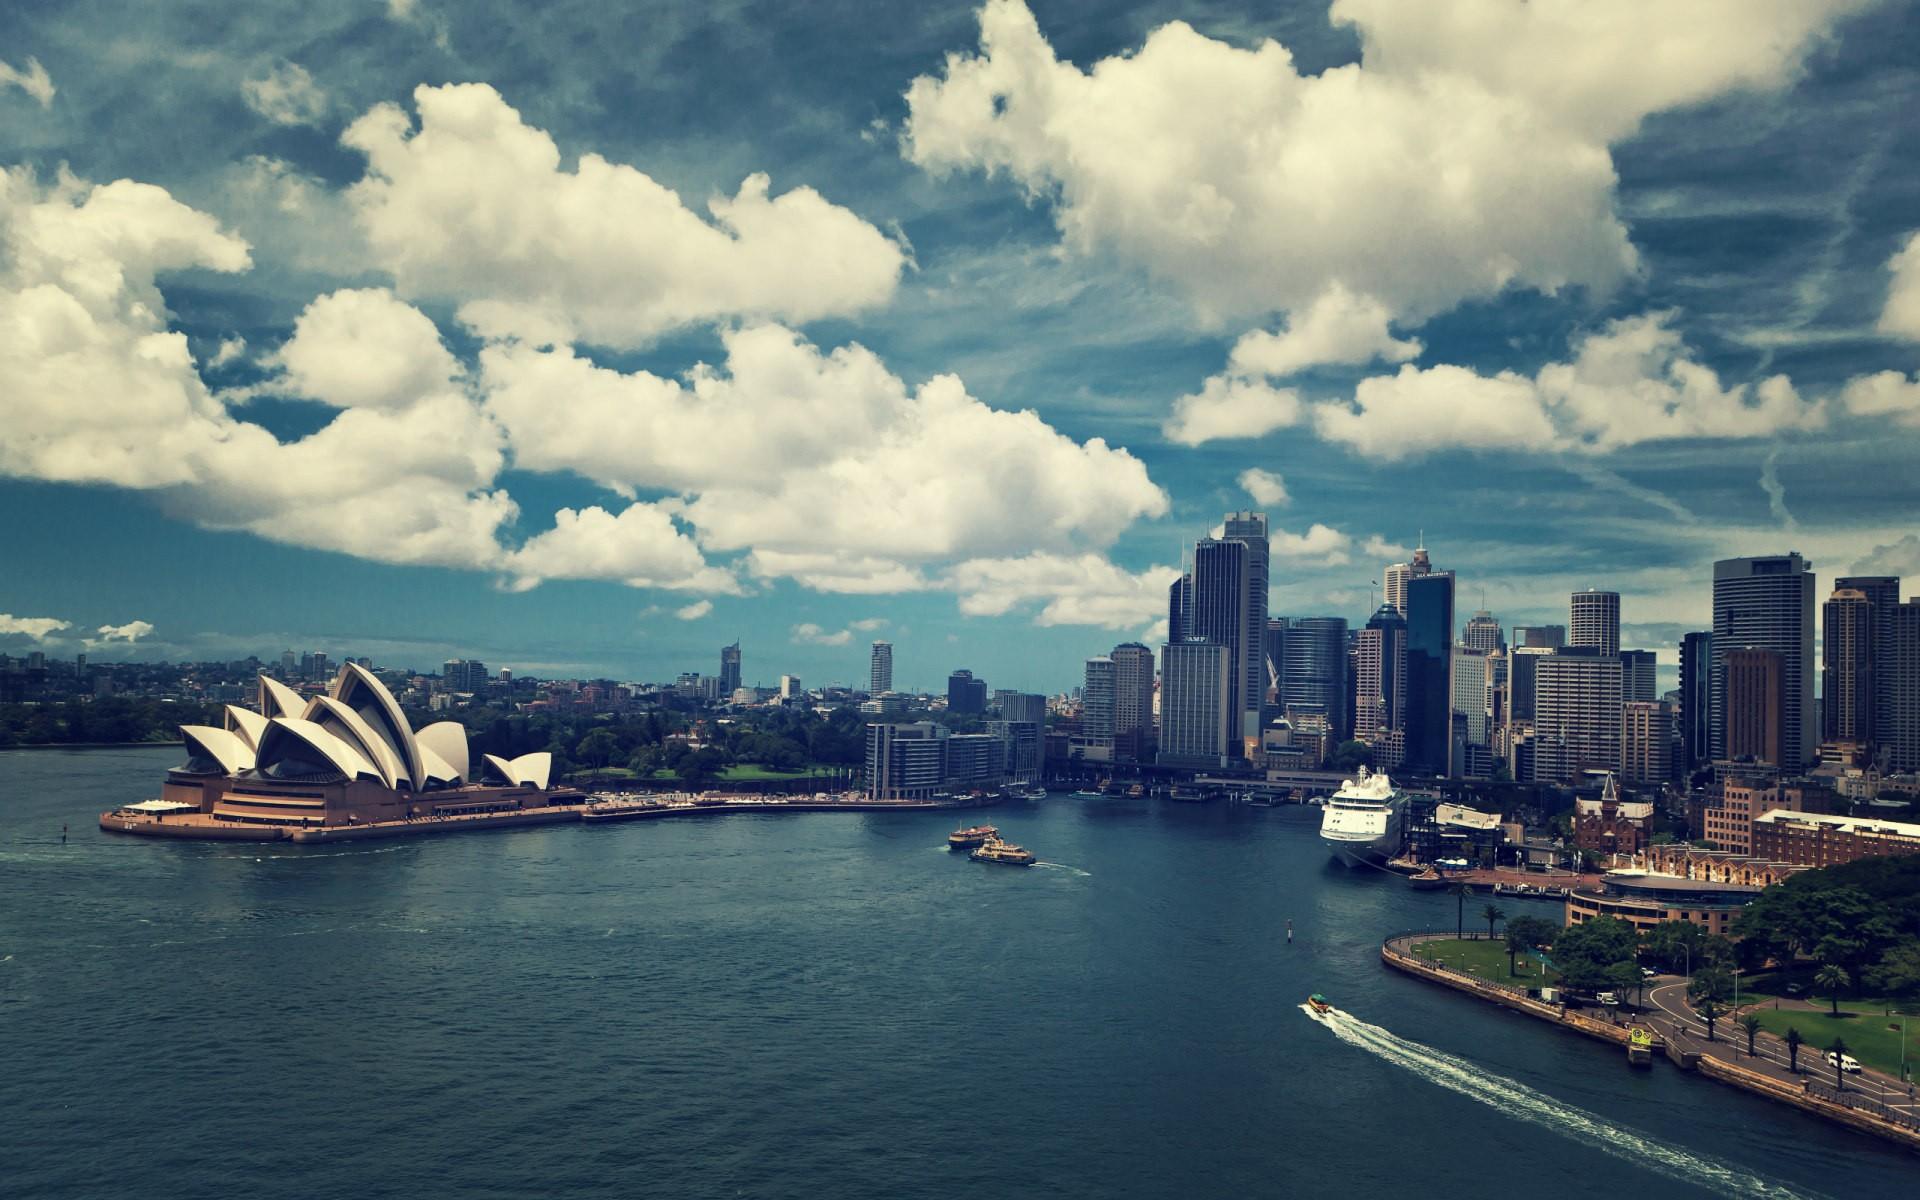 General 1920x1200 sky cityscape Sydney Sydney Opera House Australia urban building architecture city clouds water